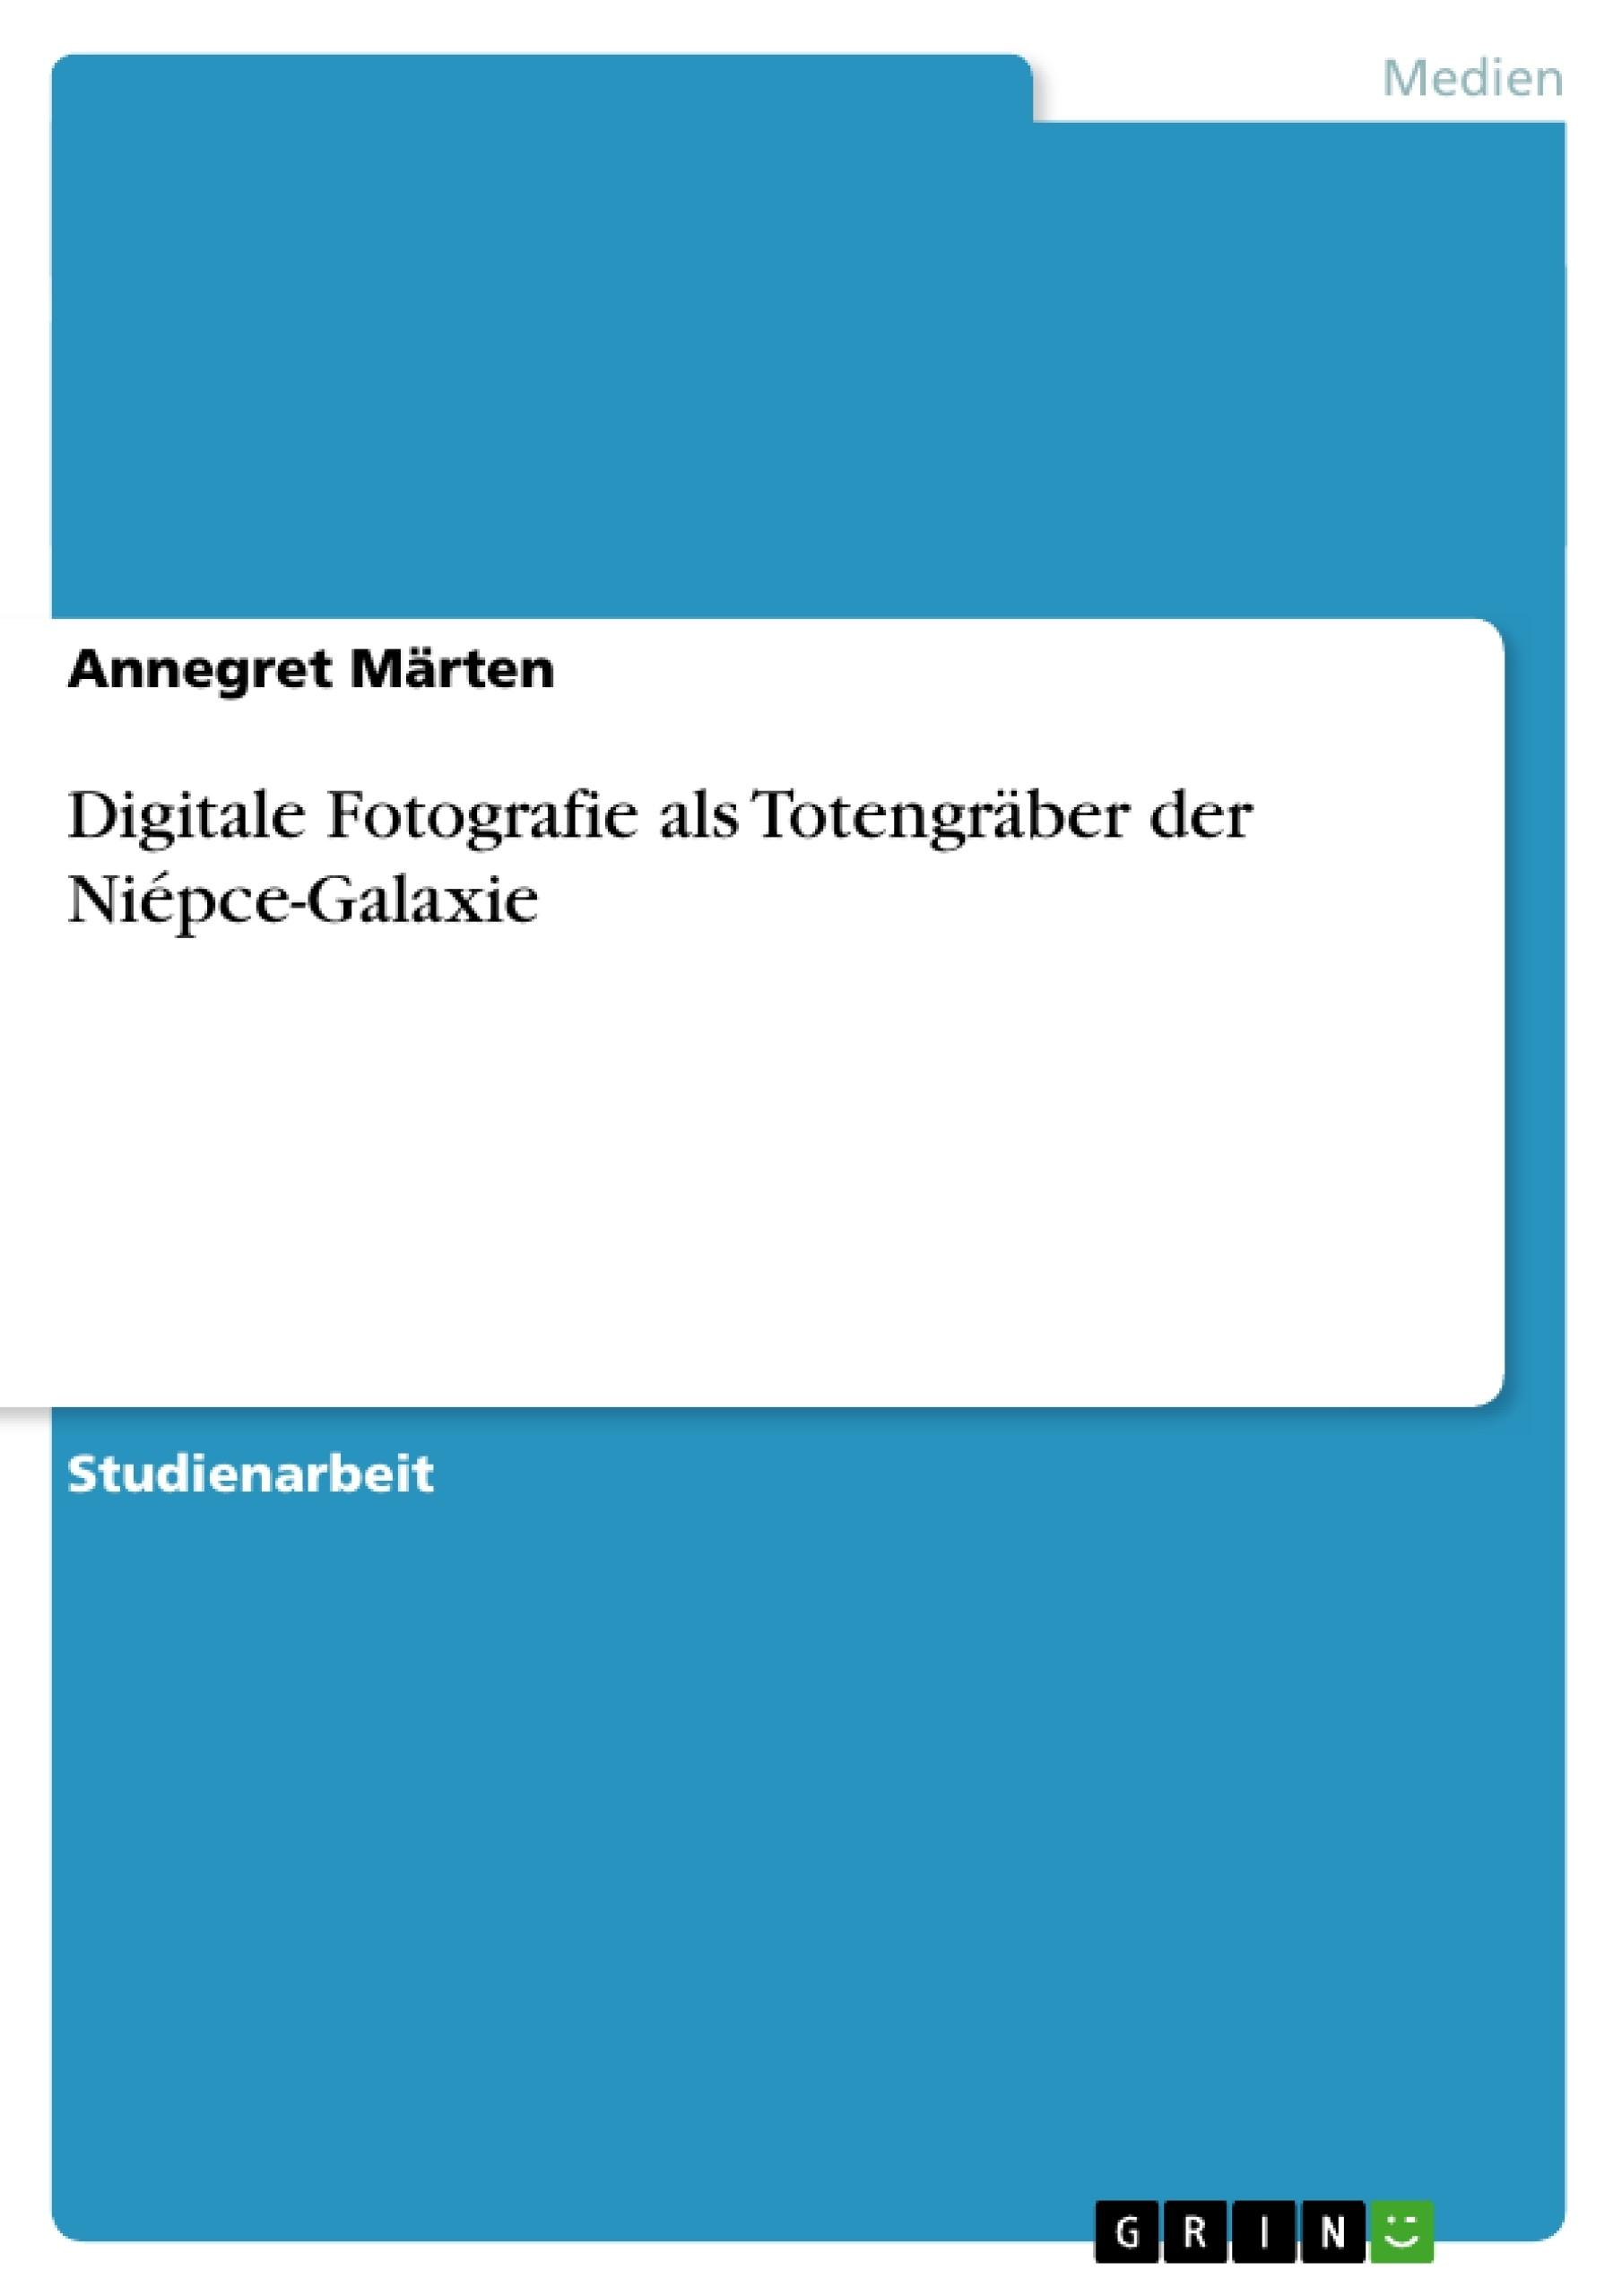 Titel: Digitale Fotografie als Totengräber der Niépce-Galaxie